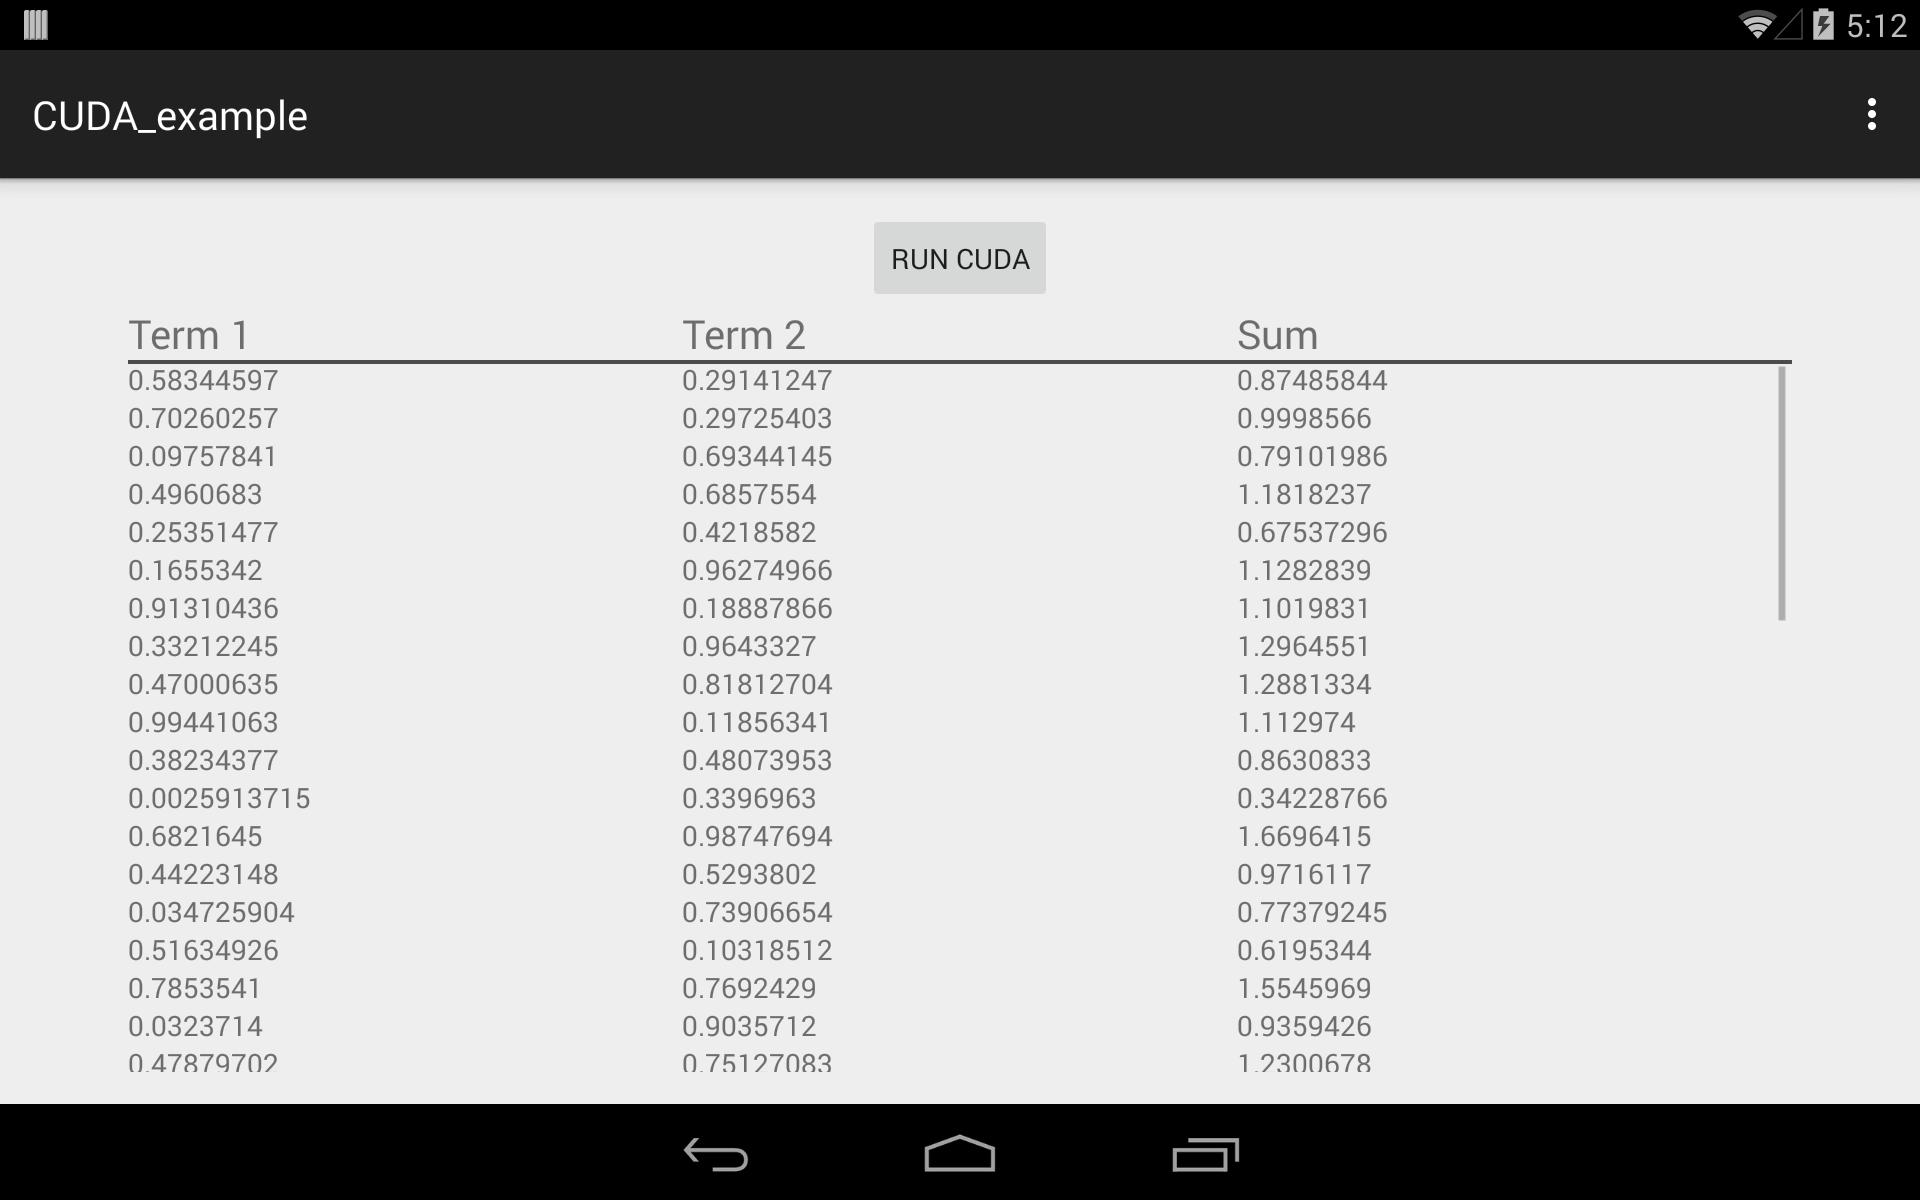 Running CUDA on Google's Project Tango Tablet